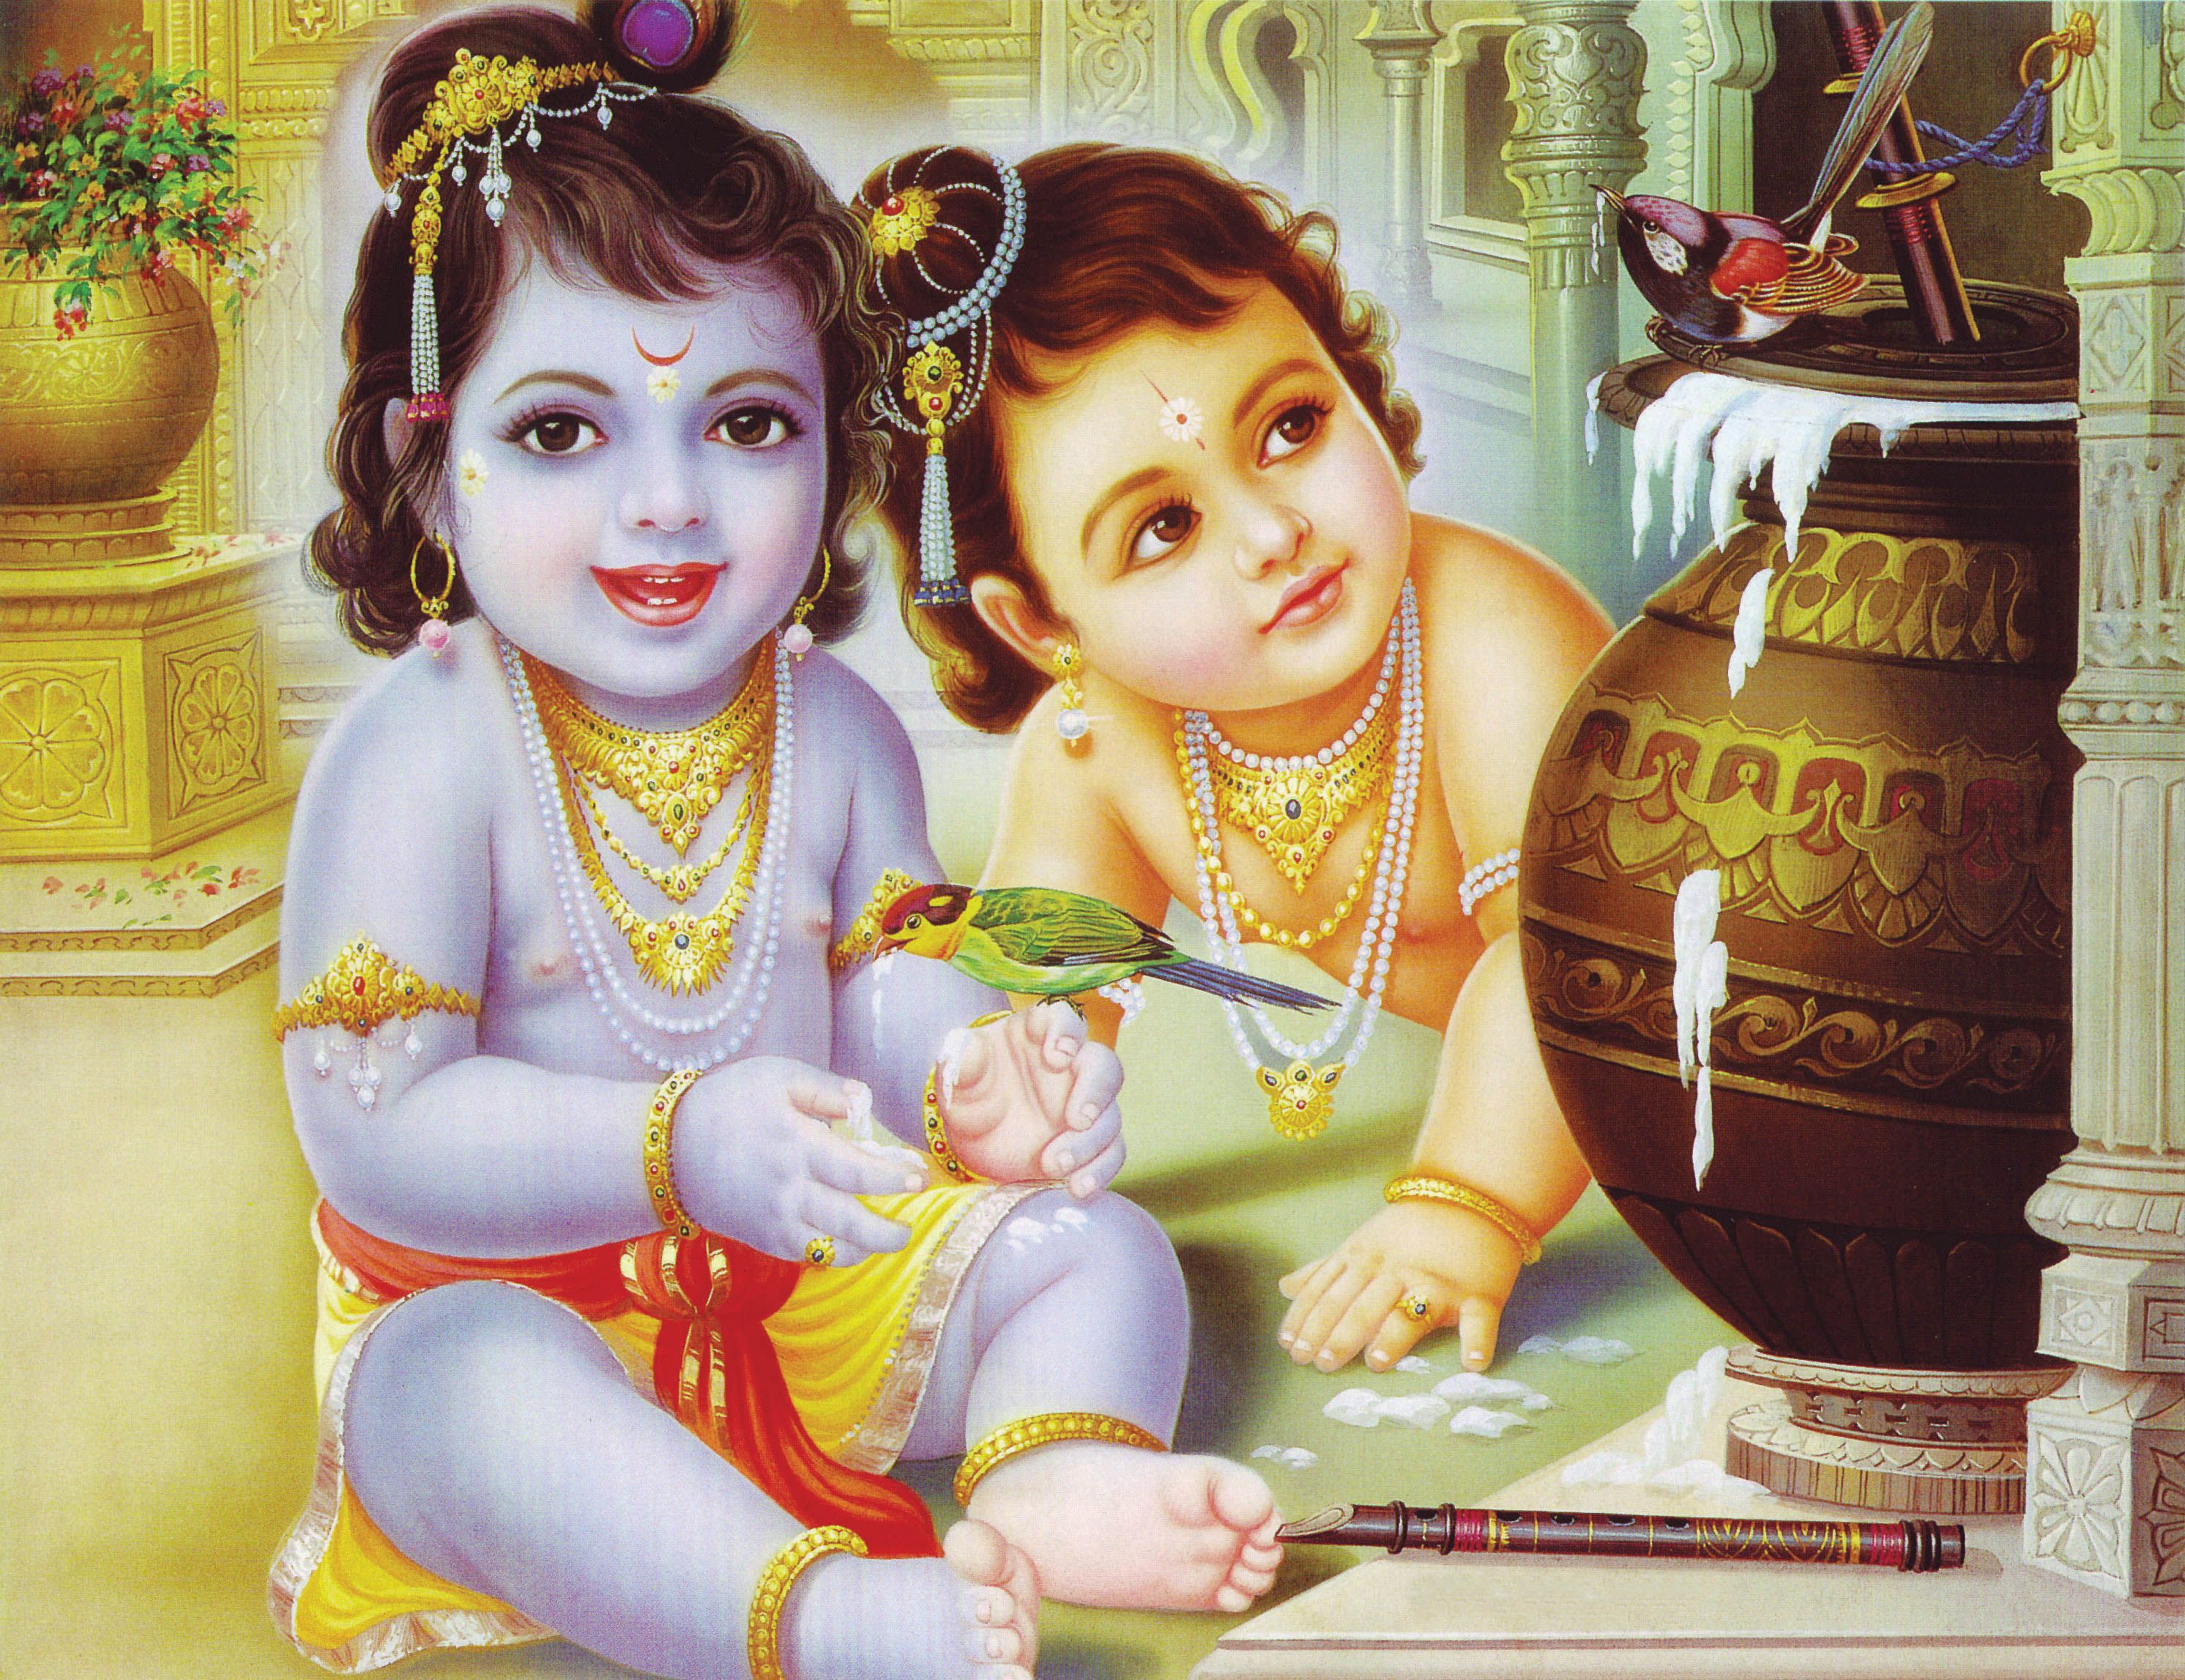 bal krishna hd wallpapers